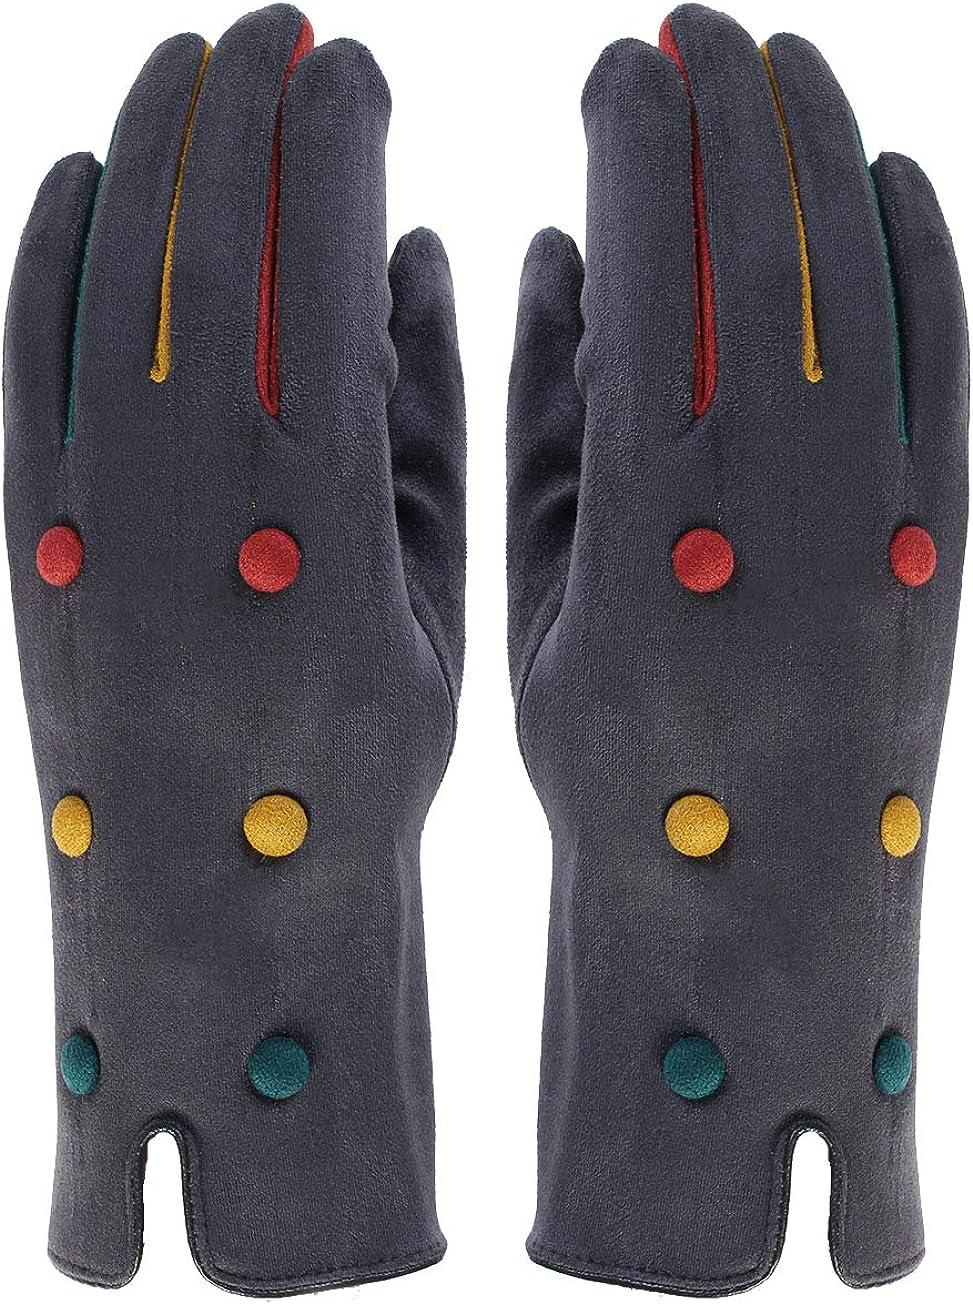 Ladies Womens Lagenlook Multicolour Button Detail Suede Effect Touch Screen Winter Gloves